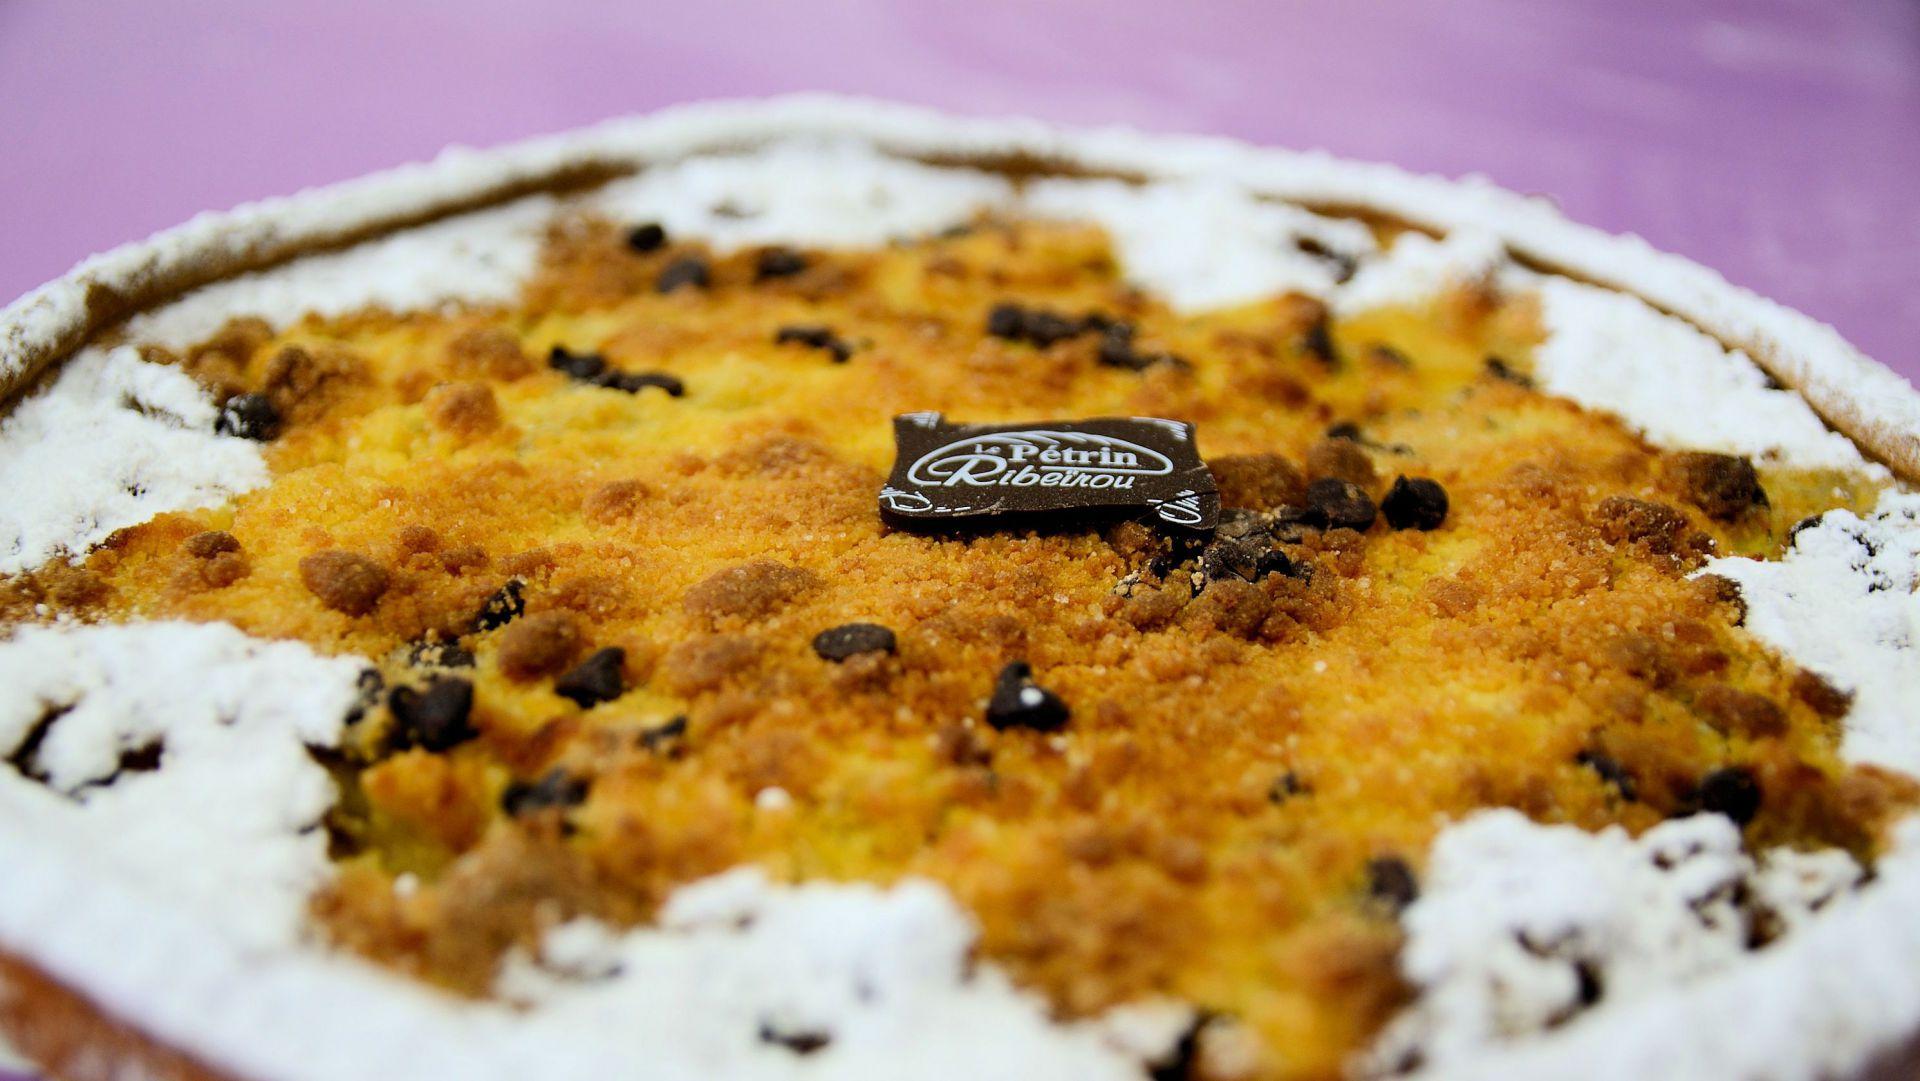 Tarte crumble poire chocolat - DSC_0513.JPG